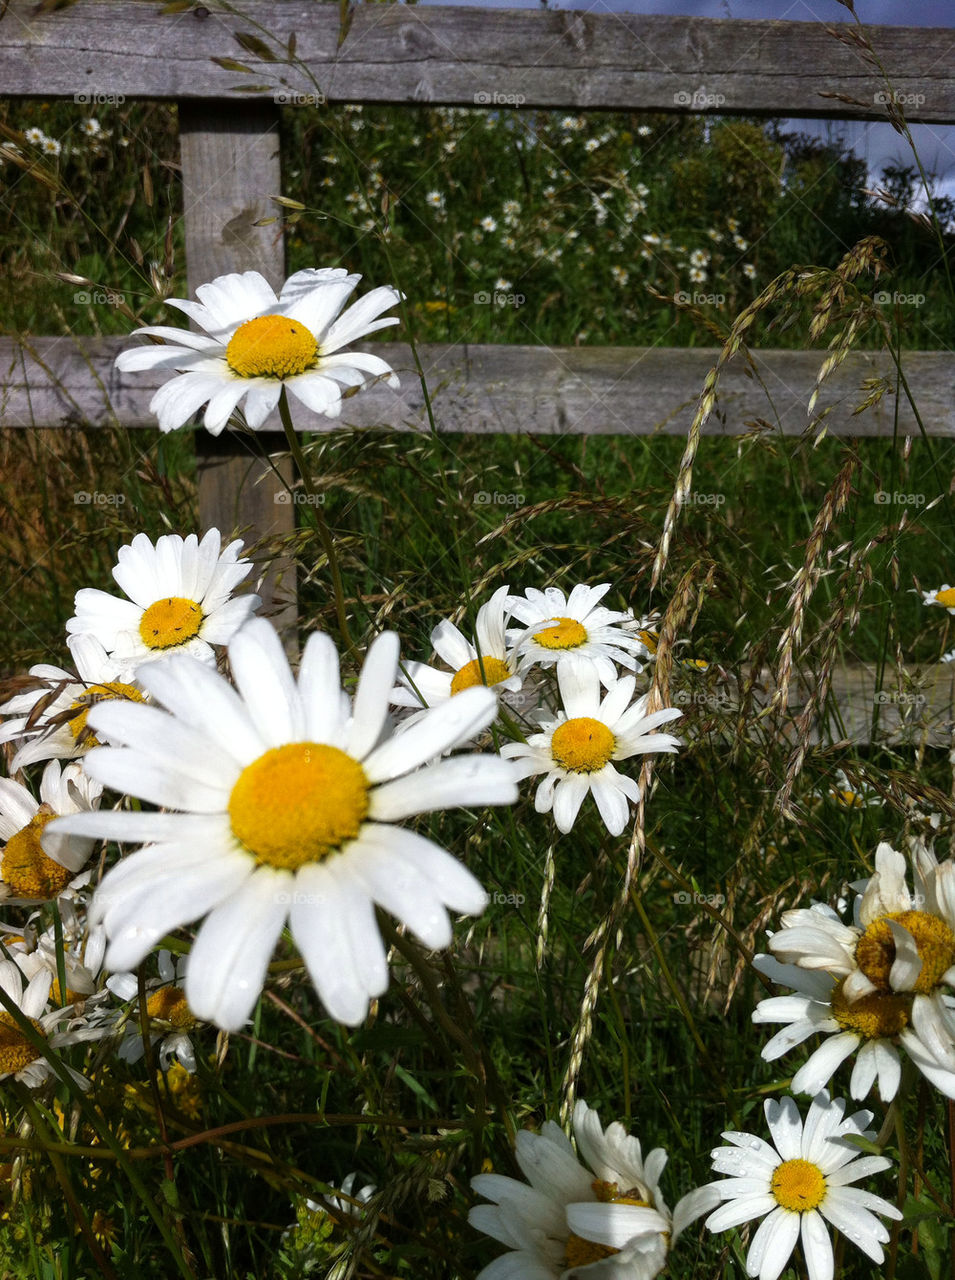 Foap wild daisies stock photo by emmam wild daisies izmirmasajfo